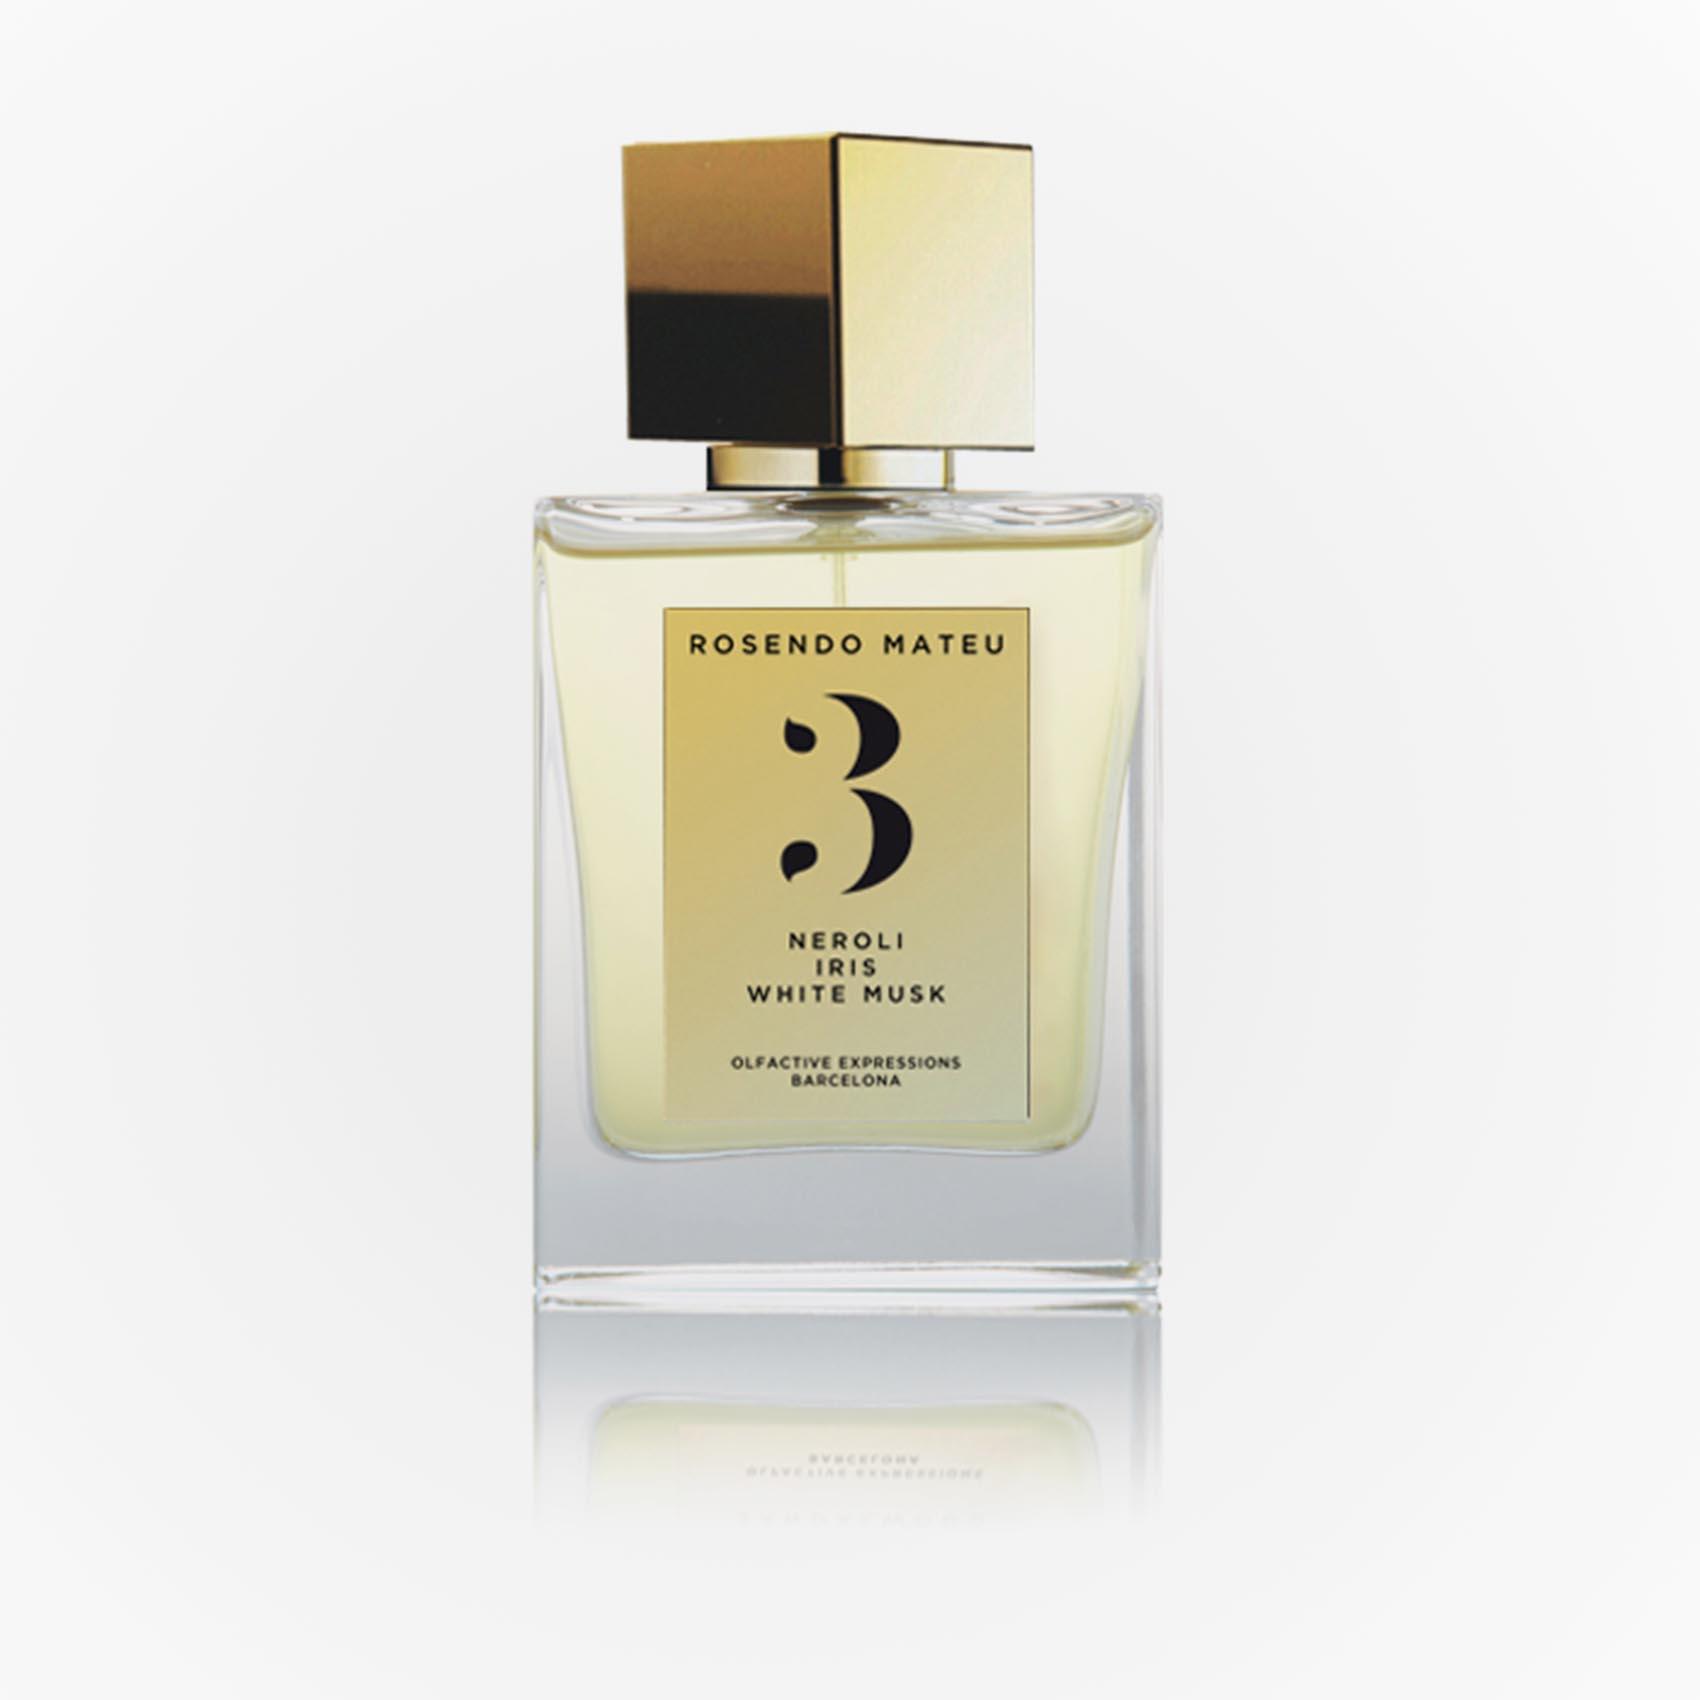 perfumes-rosendo-mateu-3